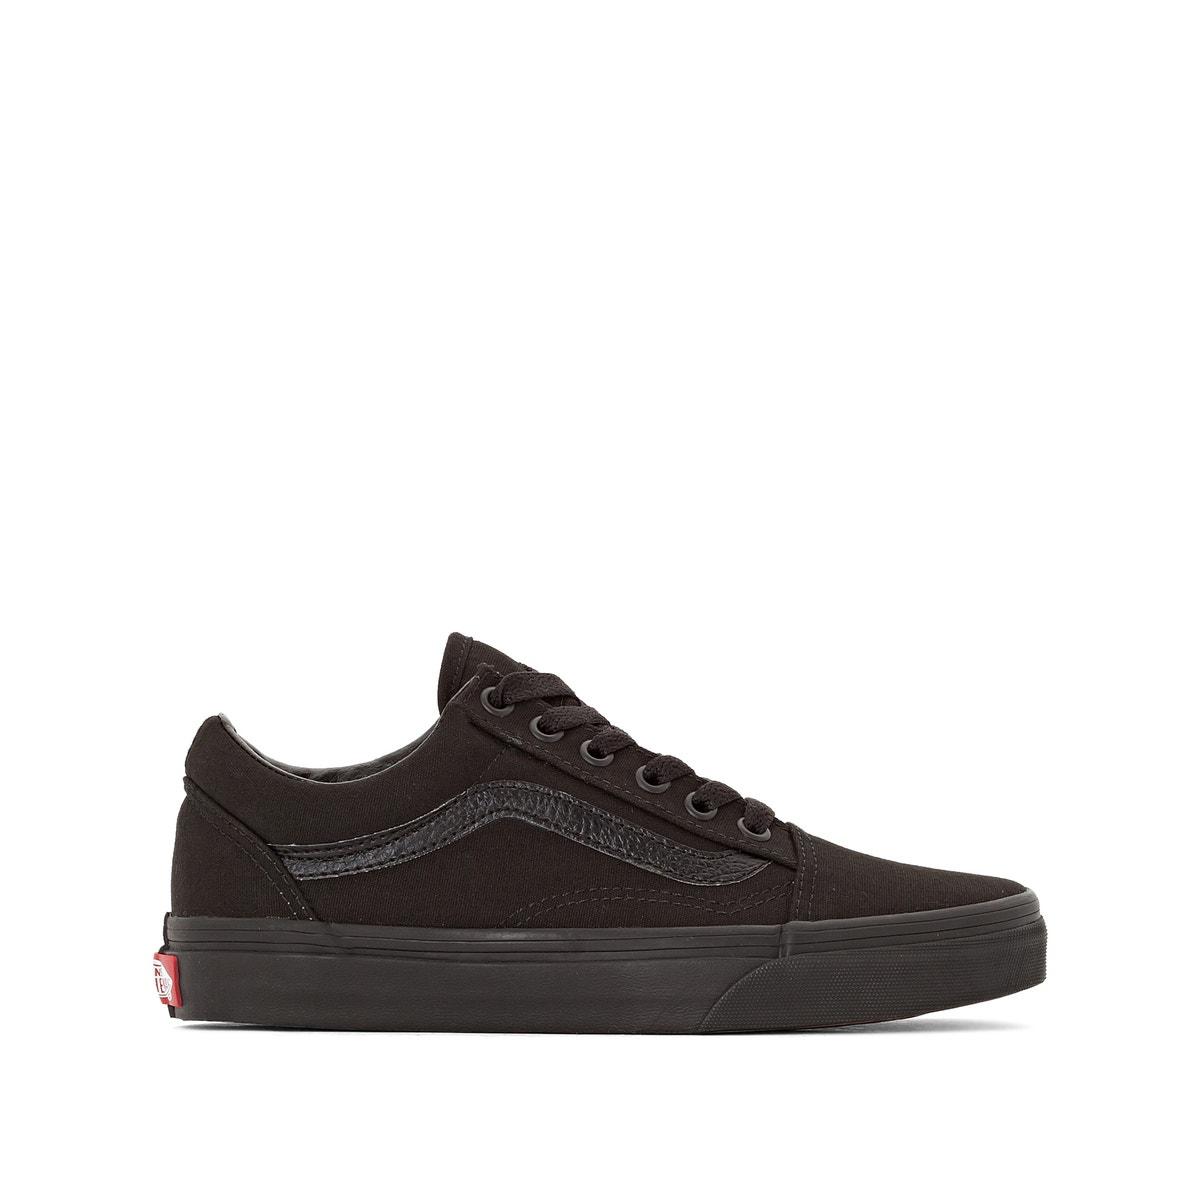 VANS Old Skool ανδρασ   παπούτσια   αθλητικά   sneakers